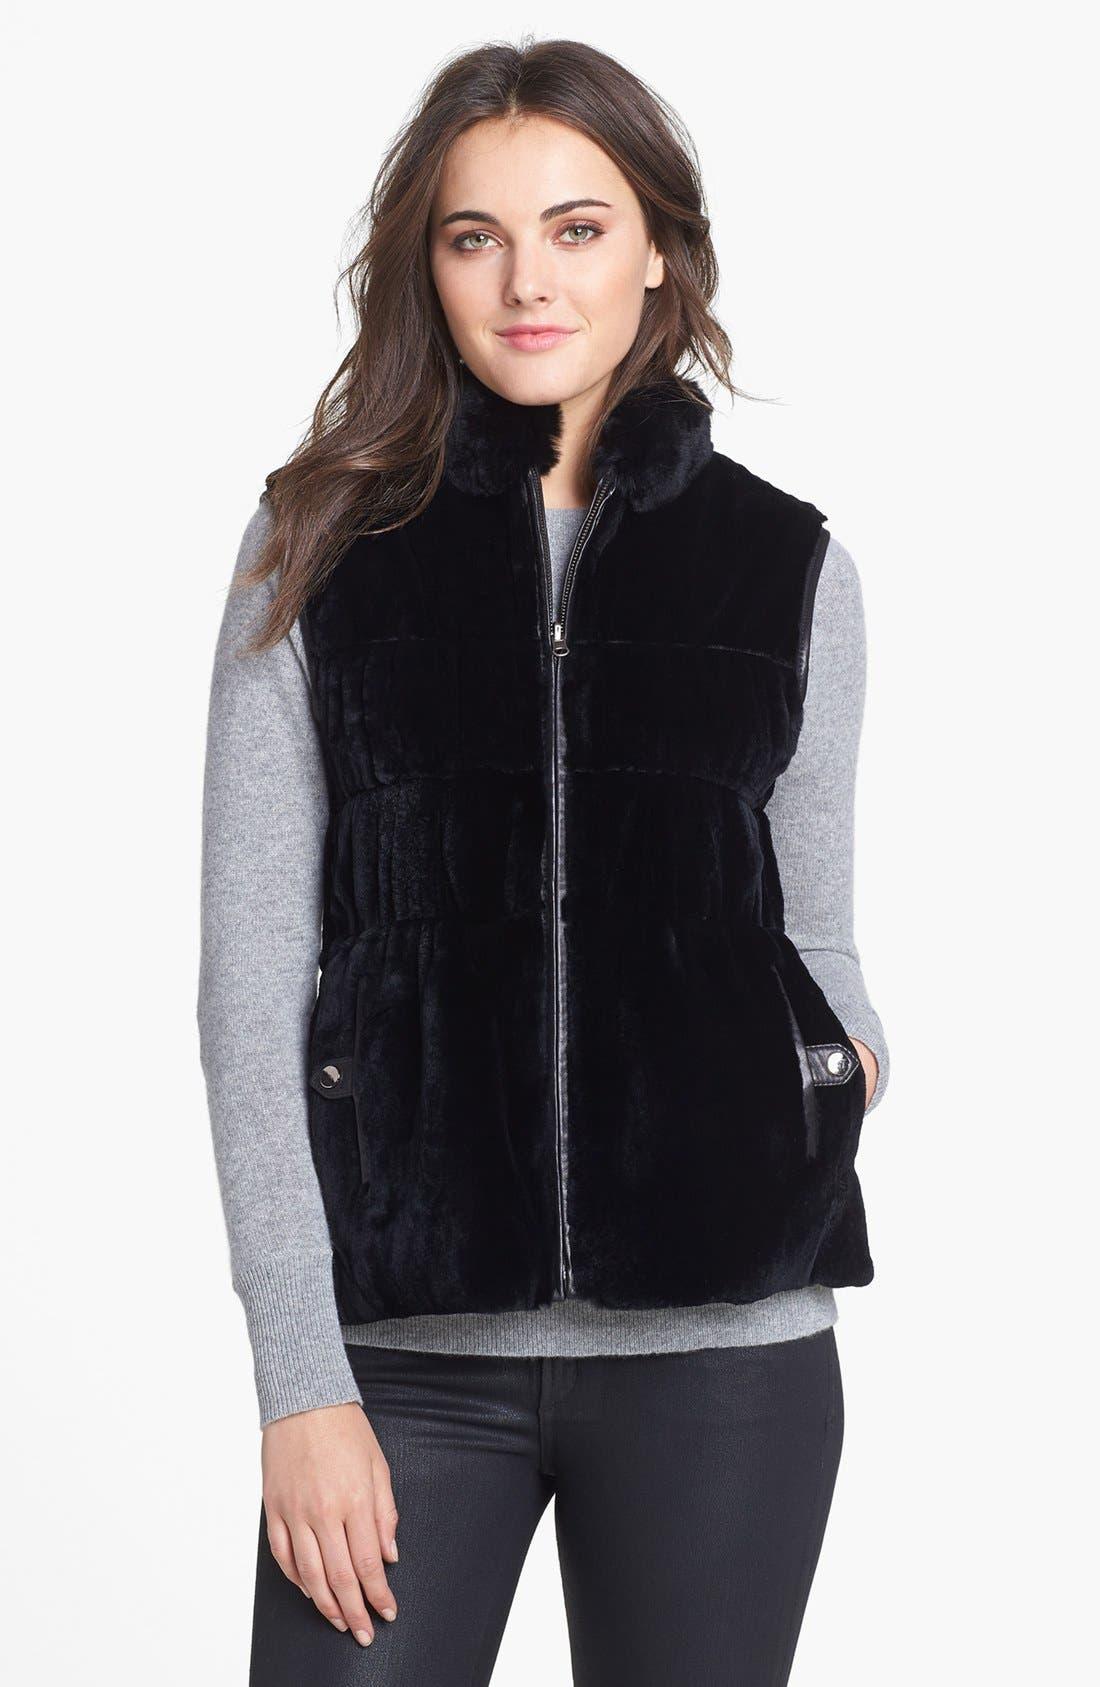 Main Image - Chosen Furs Reversible Rabbit Fur & Lambskin Leather Vest